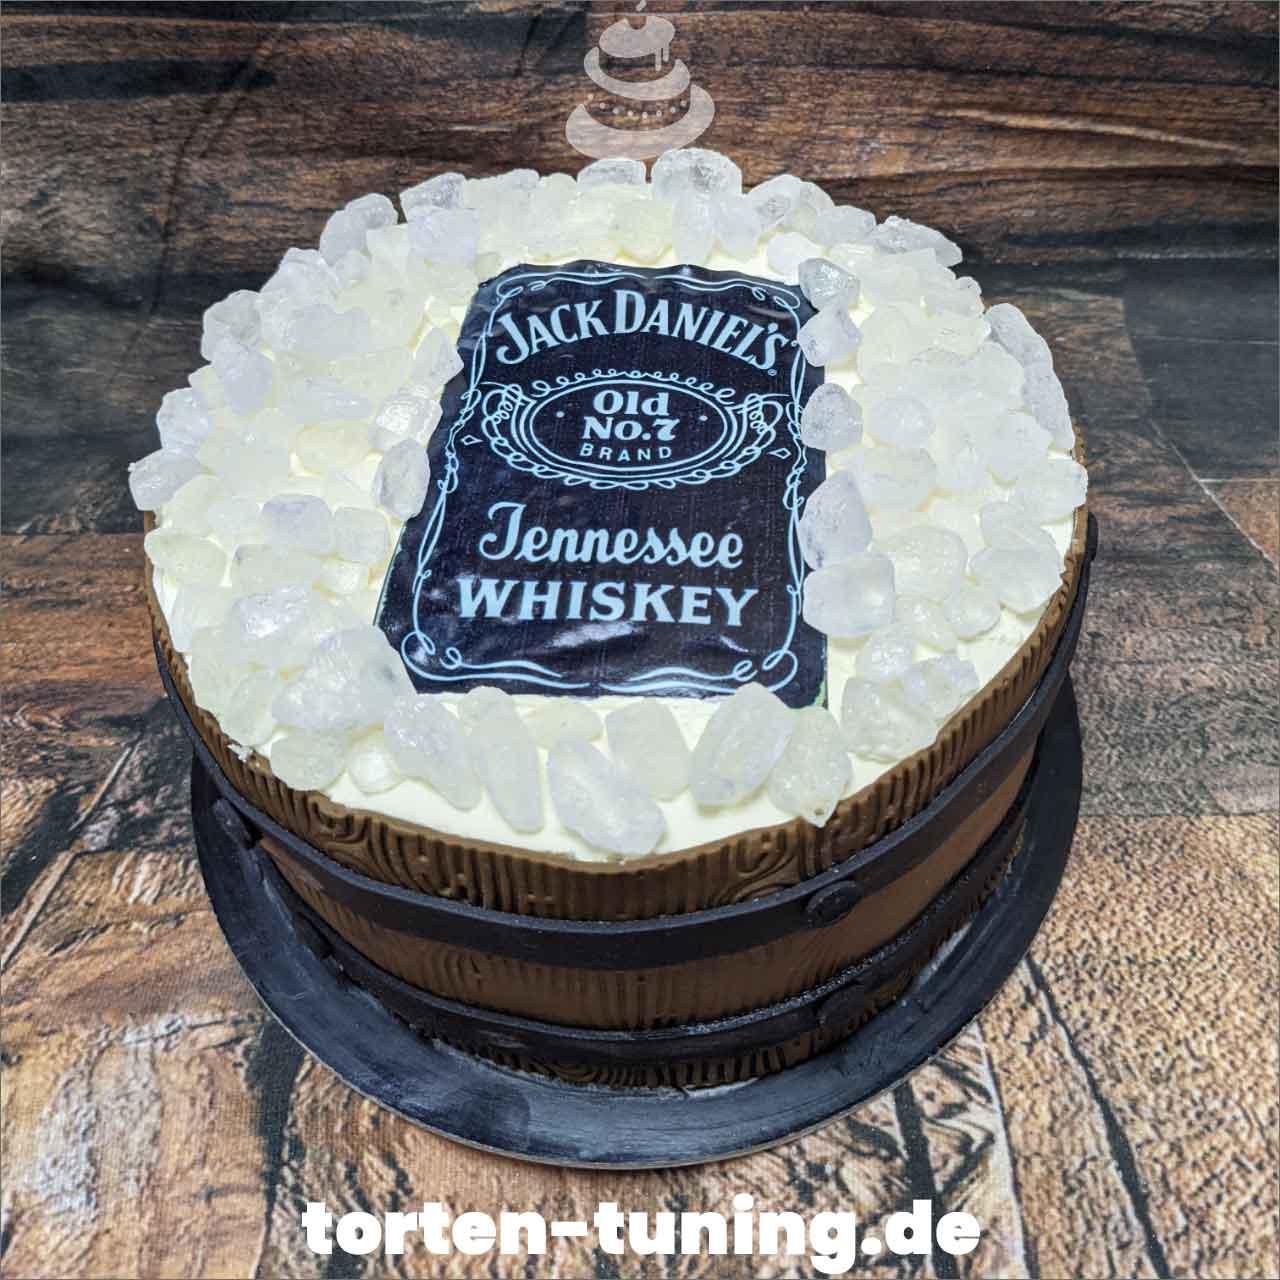 Jack Daniels Dripcake Obsttorte Geburtstagstorte Motivtorte Torte Tortendekoration Torte online bestellen Suhl Thüringen Torten Tuning Sahnetorte Tortenfiguren Cake Topper